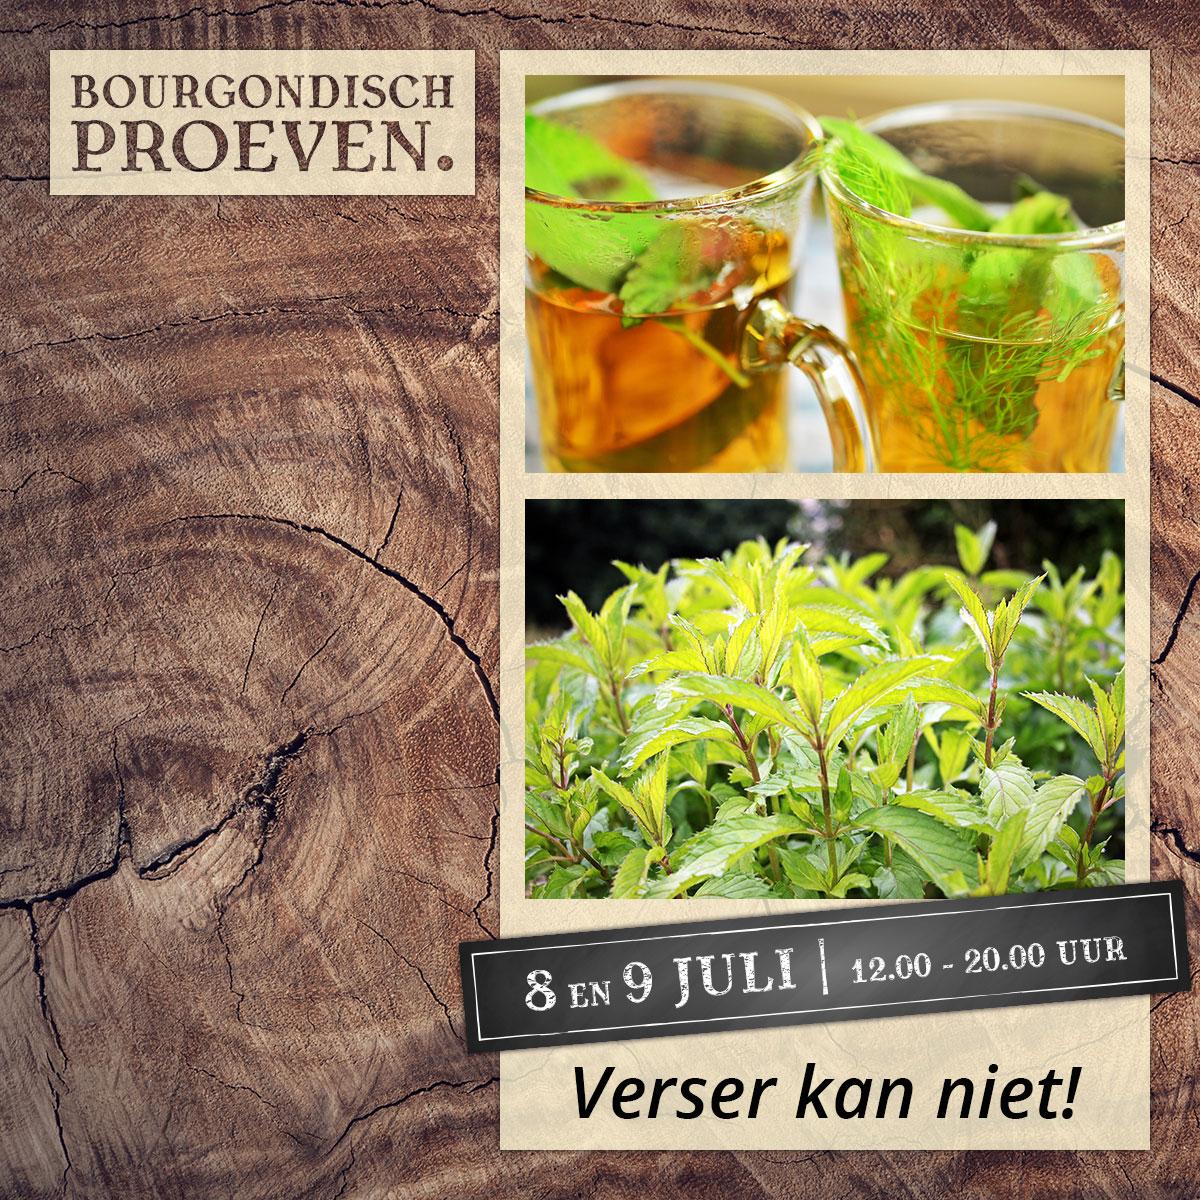 De Bourgondiër – Bourgondisch Proeven. – Facebookbericht – Verser-kan-niet!